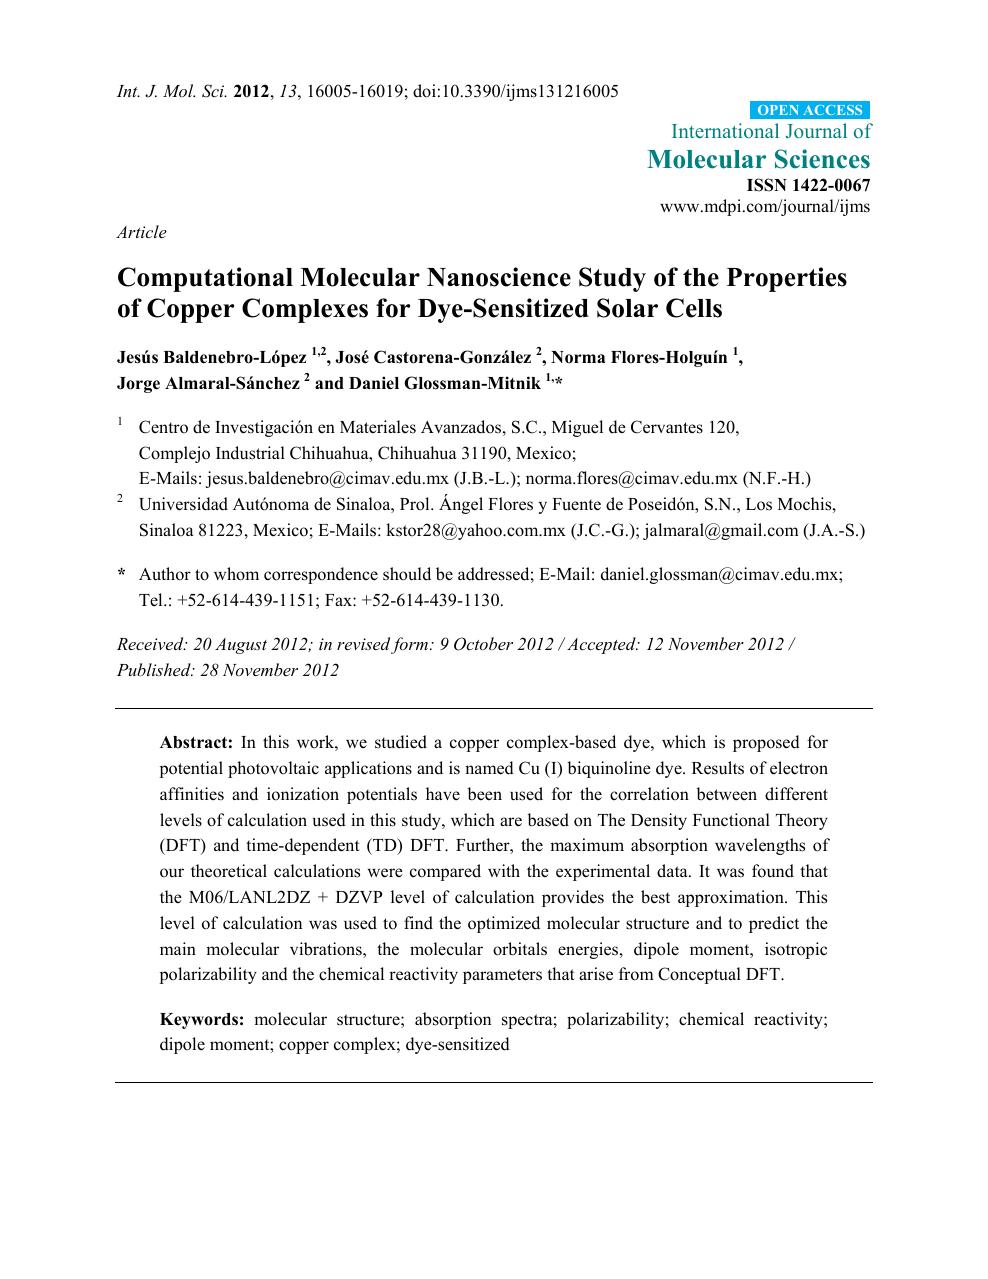 Computational Molecular Nanoscience Study of the Properties